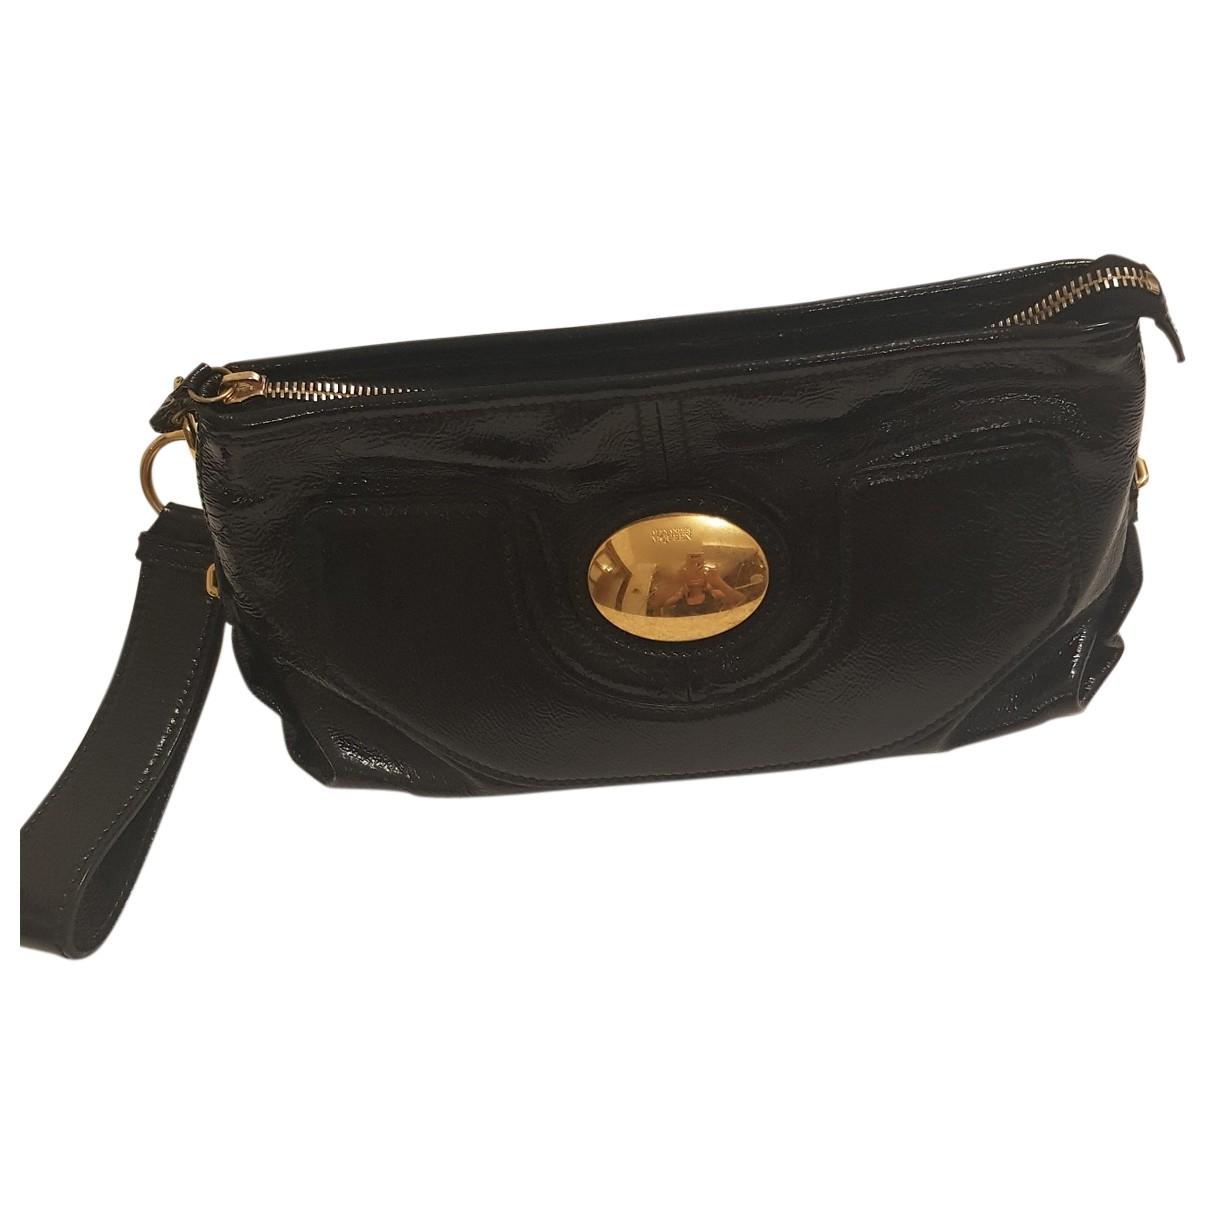 Alexander Mcqueen N Black Patent leather Clutch bag for Women N